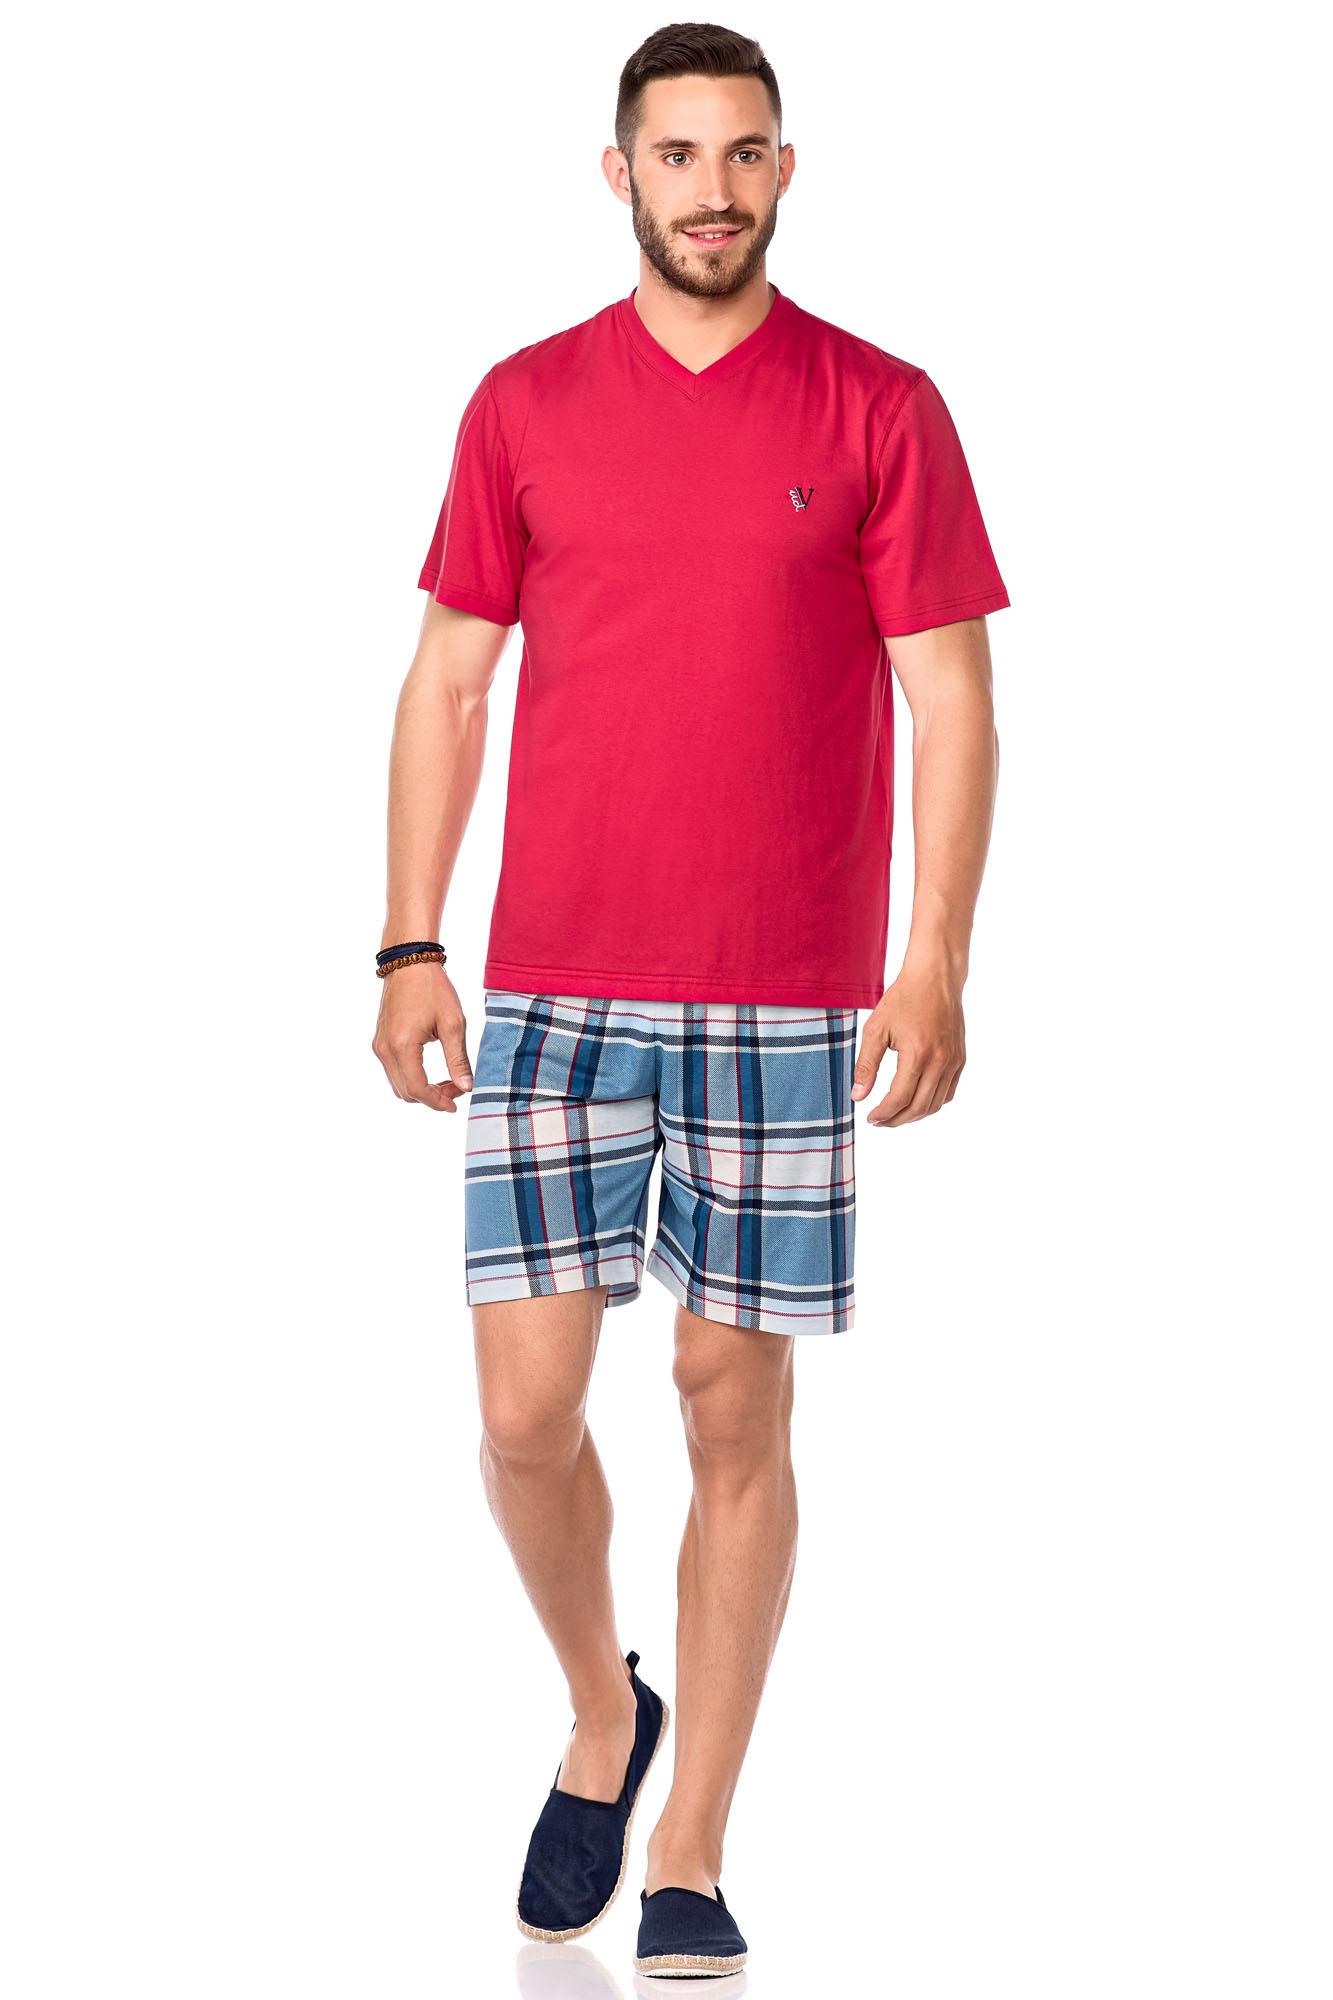 Pánské pyžamo 15-7004 Vamp - Červená-modrá/L